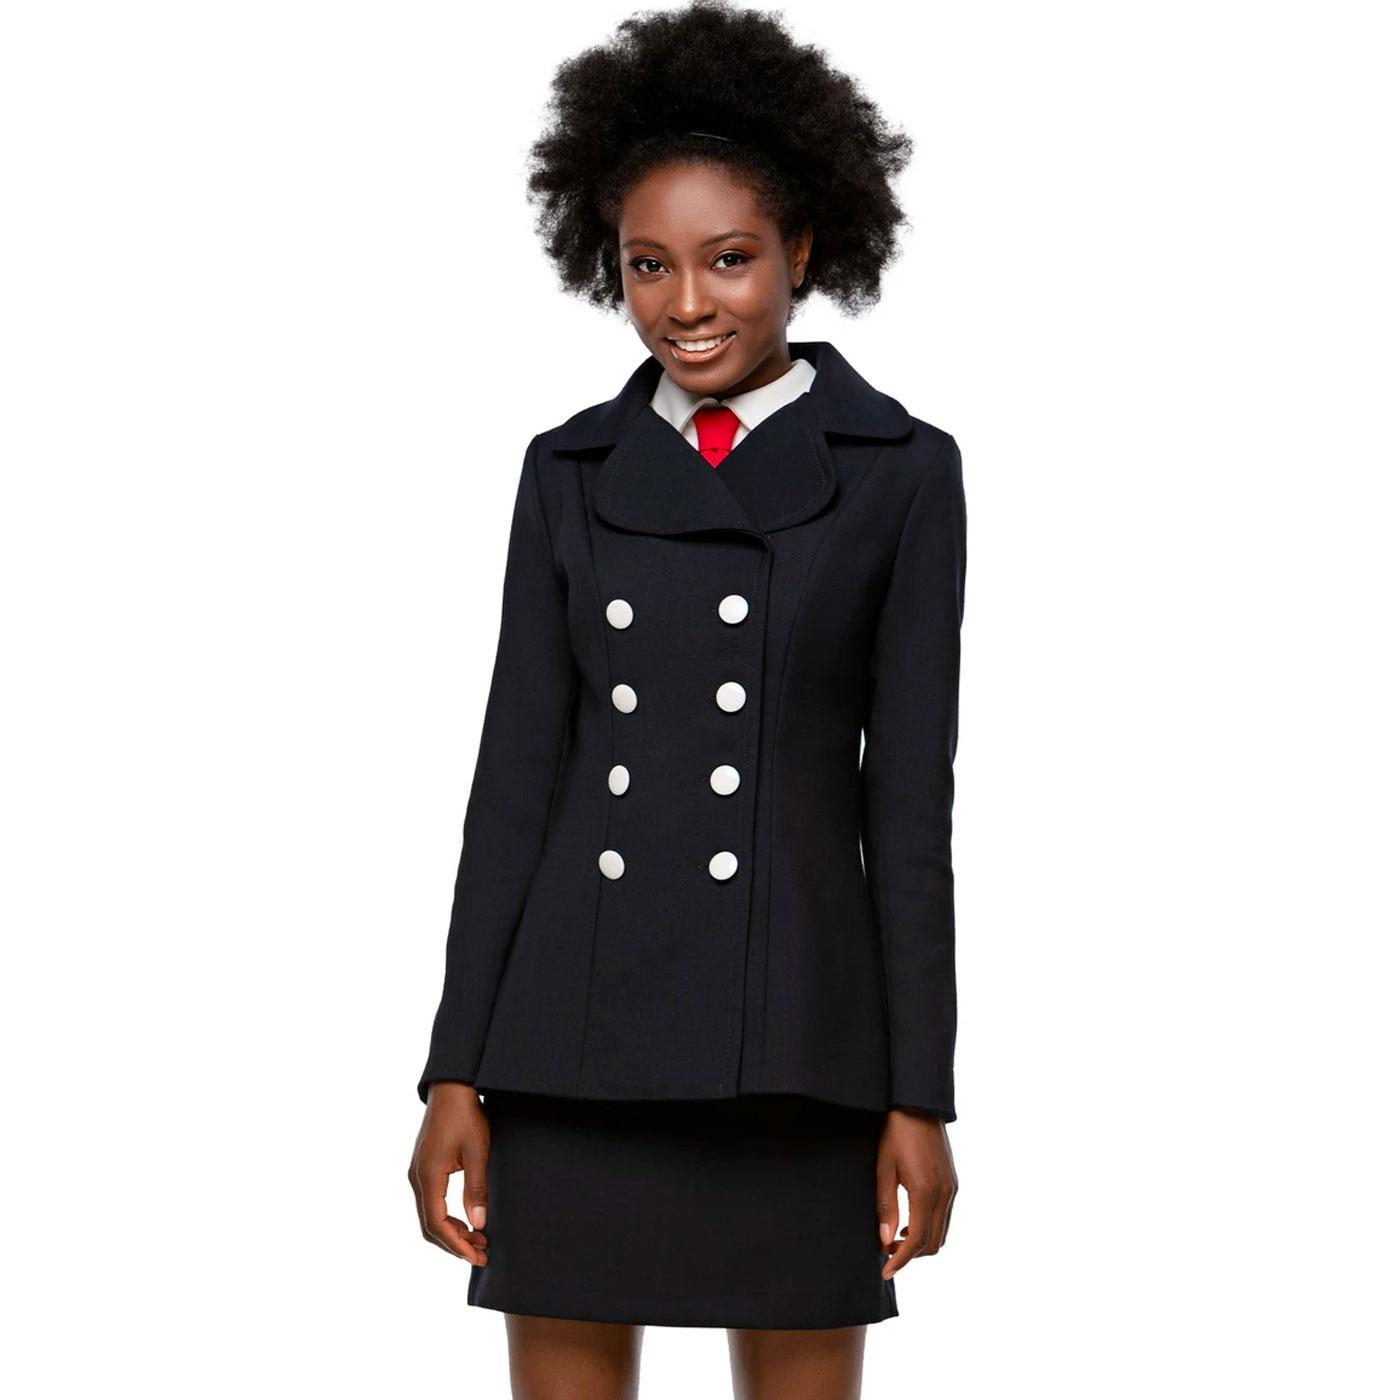 MARMALADE Autumn Round collar 1960s Mod Jacket